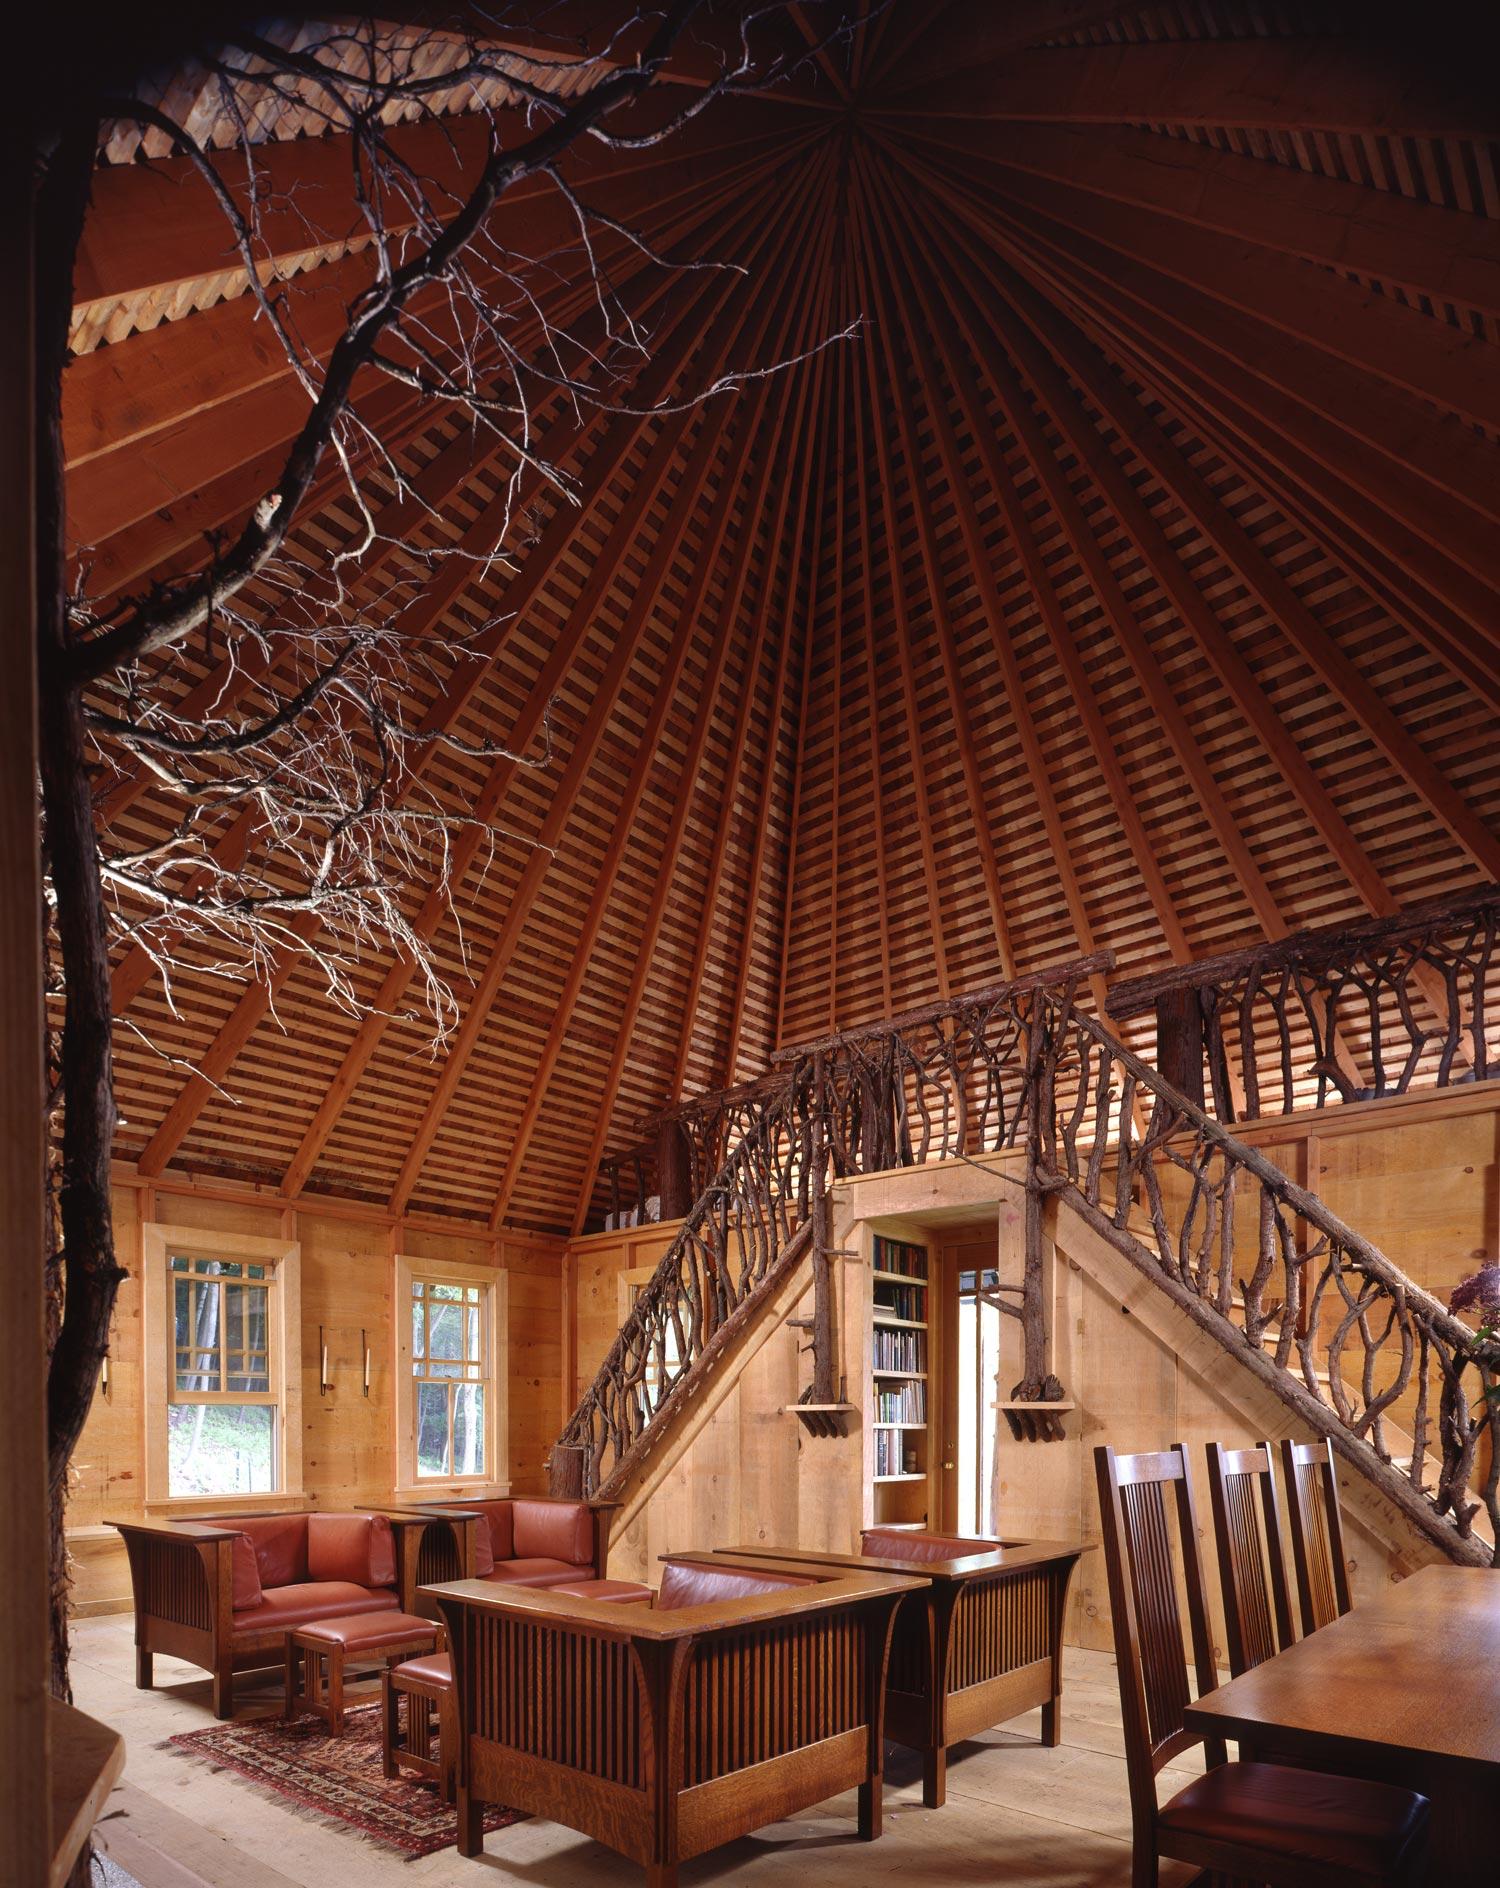 Cabin in the Woods 2.jpg